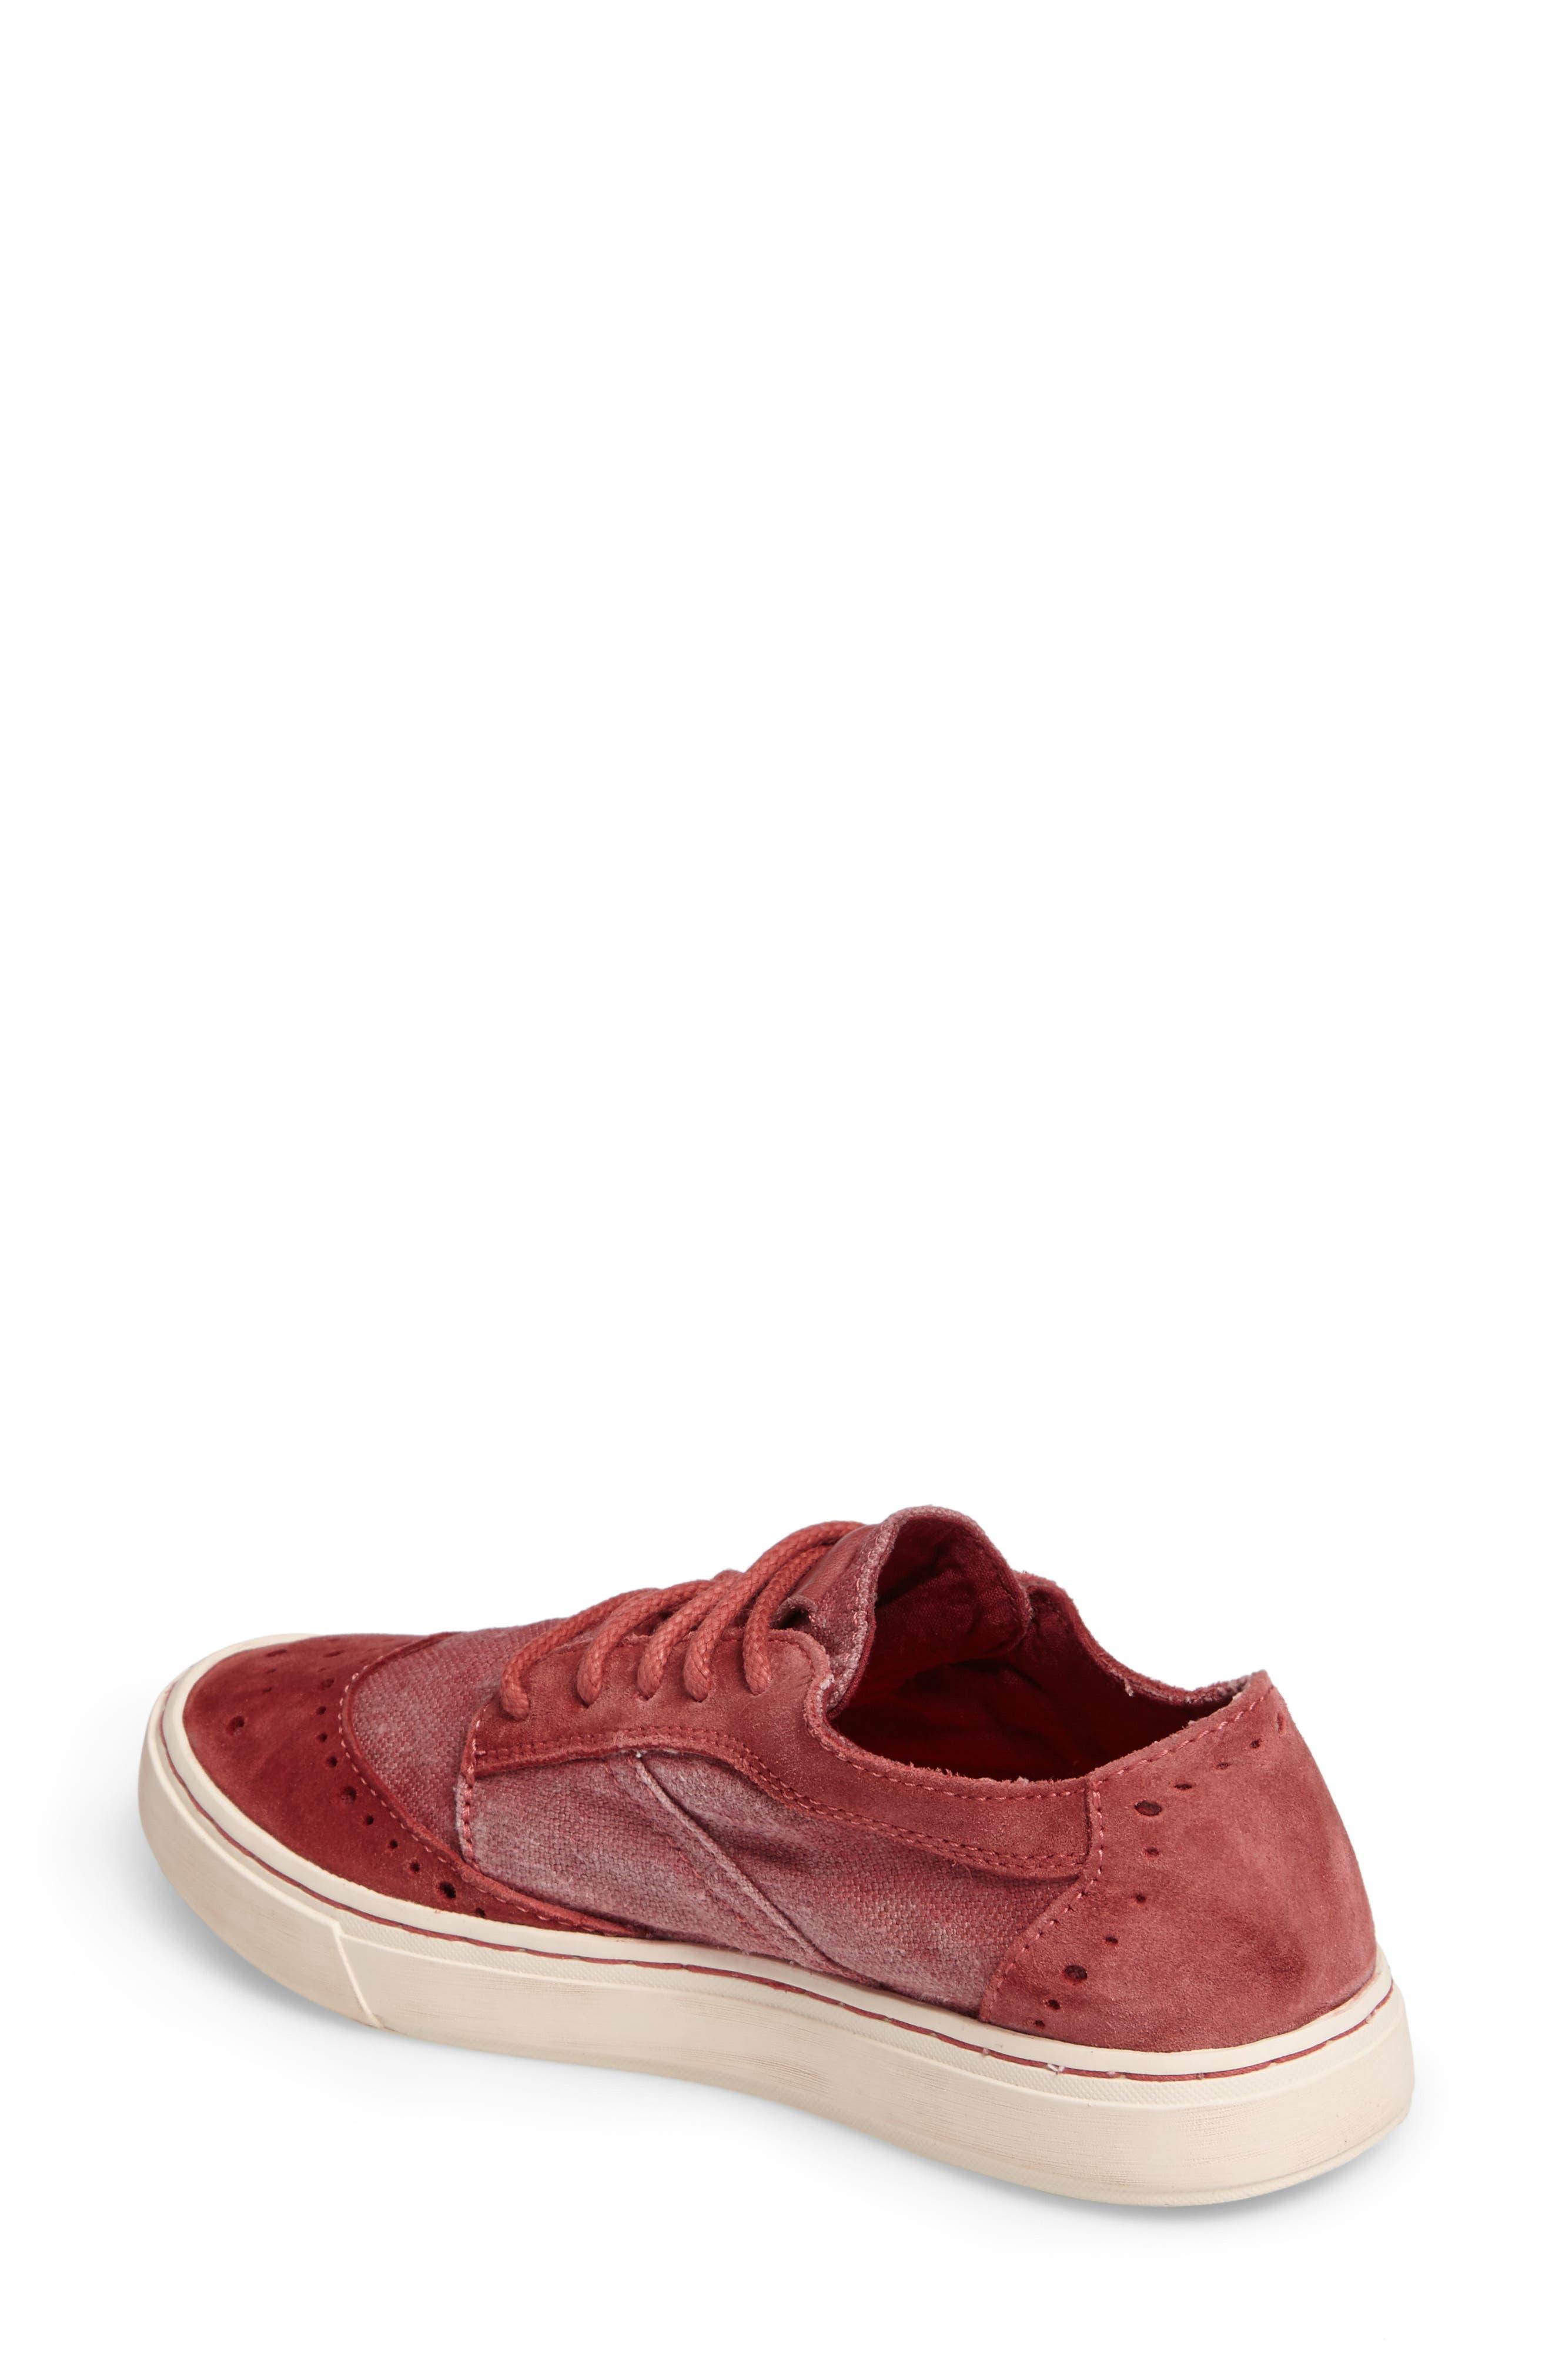 Yukai Sneaker,                             Alternate thumbnail 2, color,                             SANDALWOOD